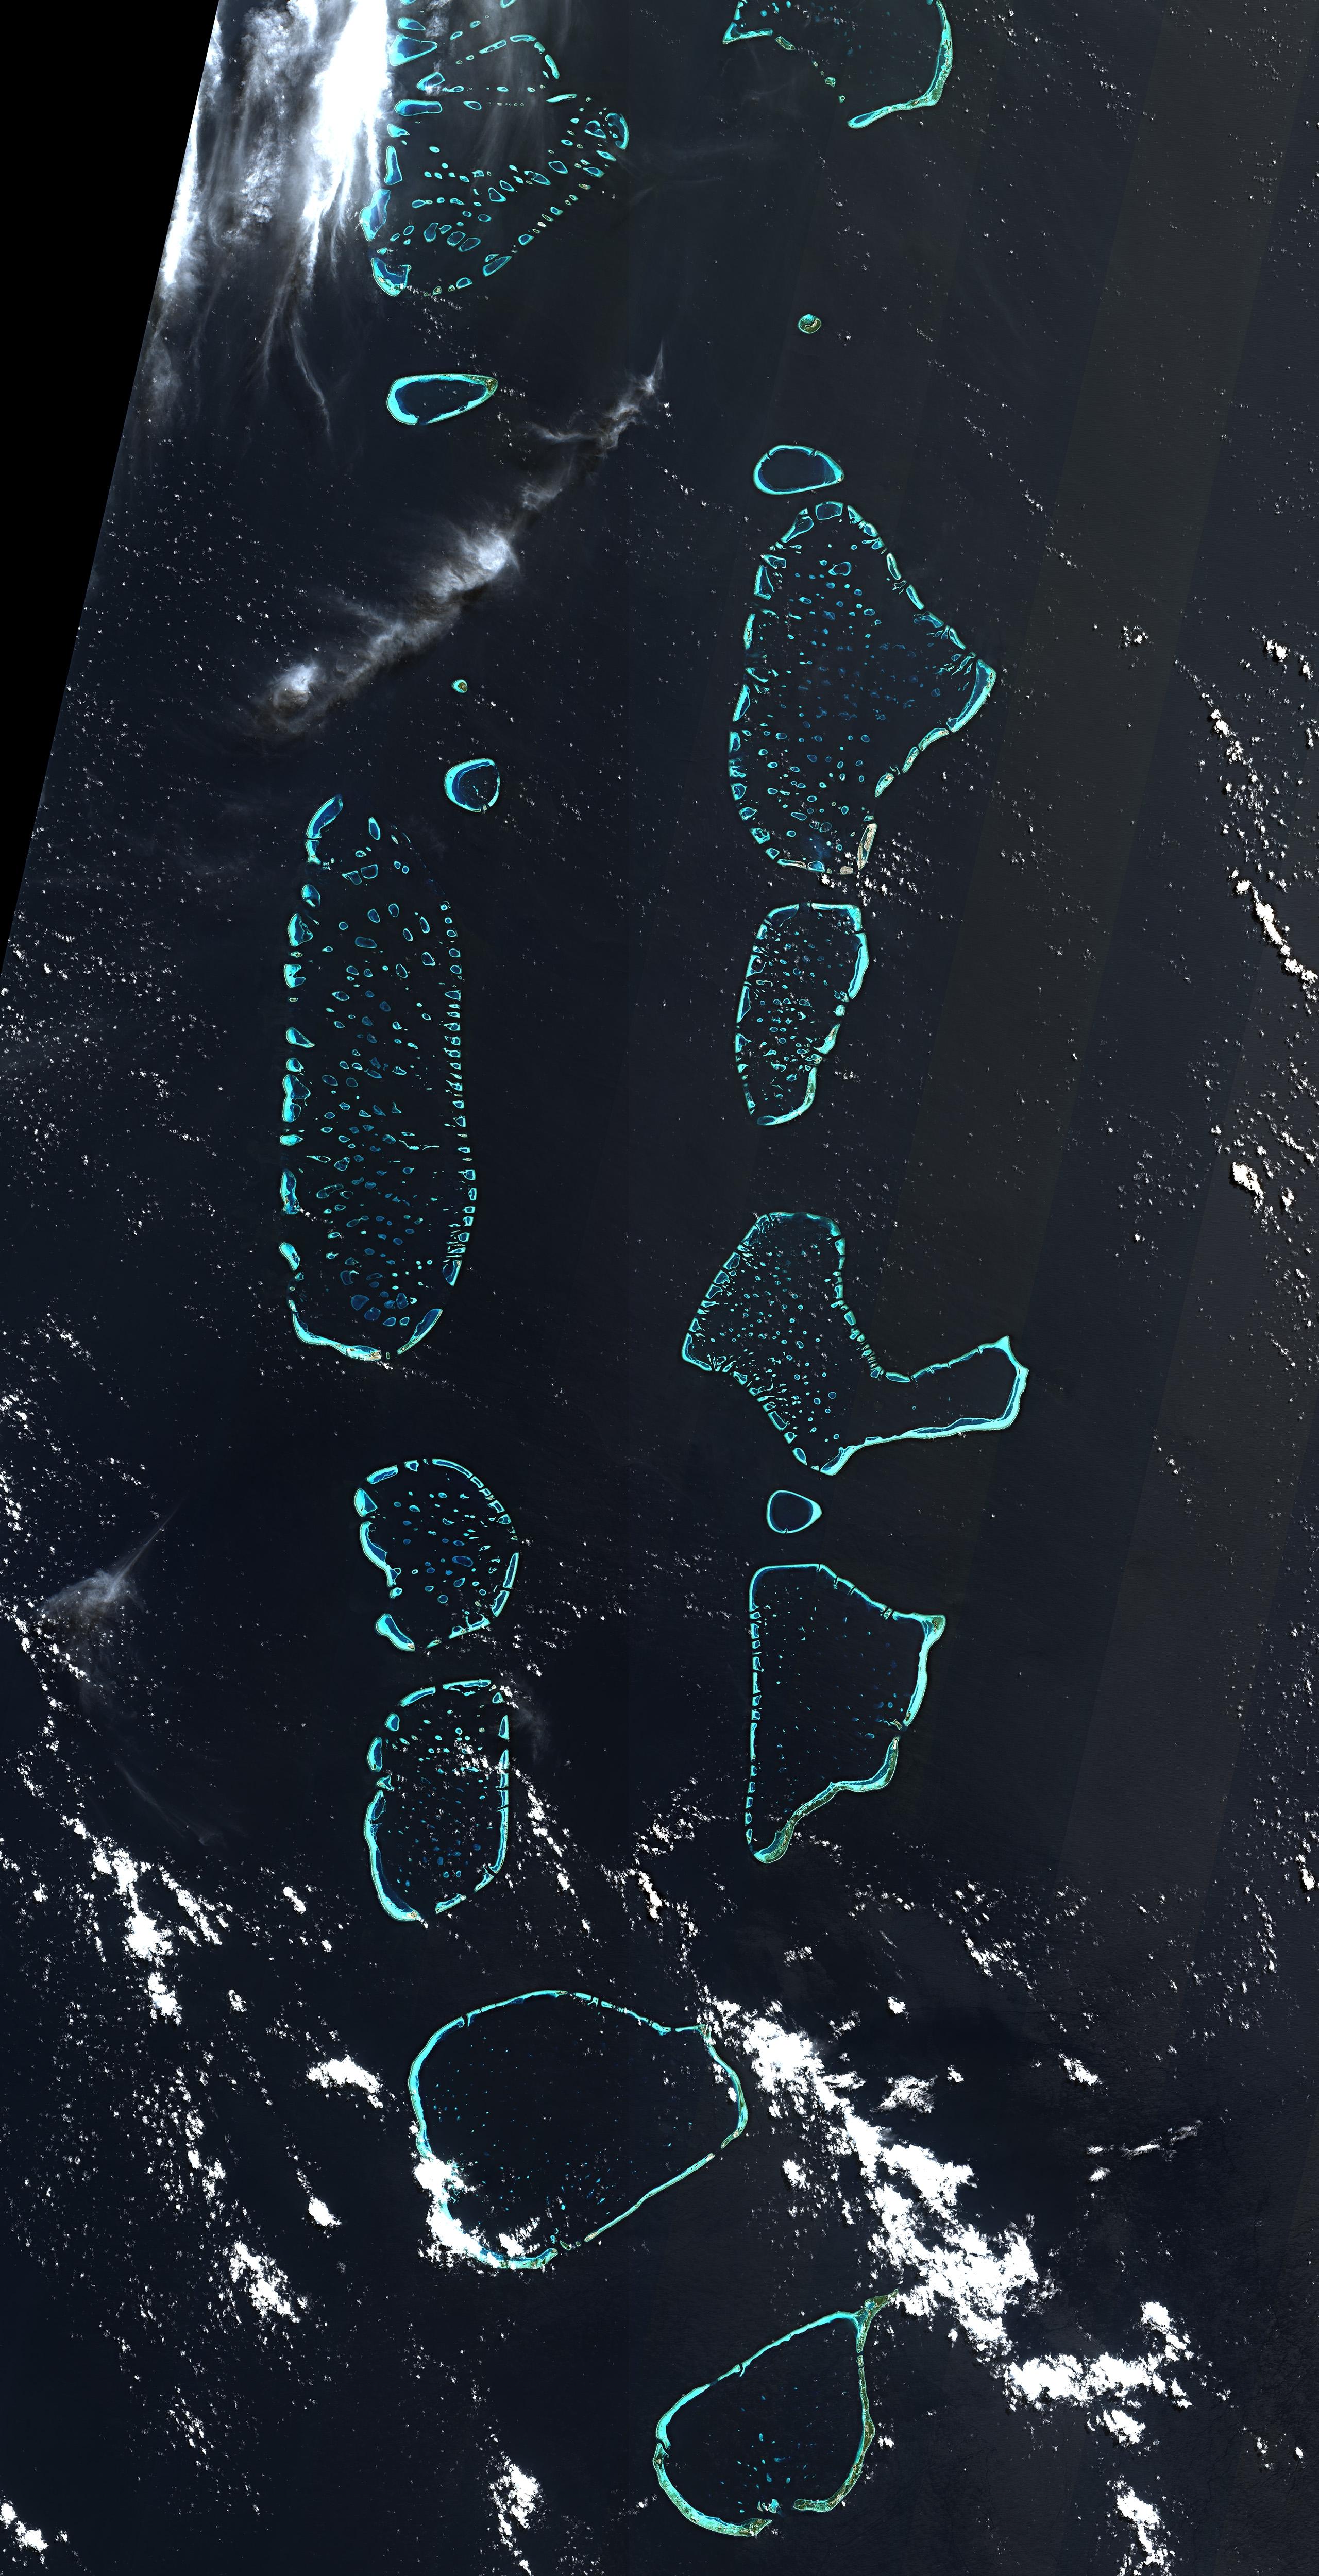 em_maldives-s2a_msil2a_20200630t053721.jpg